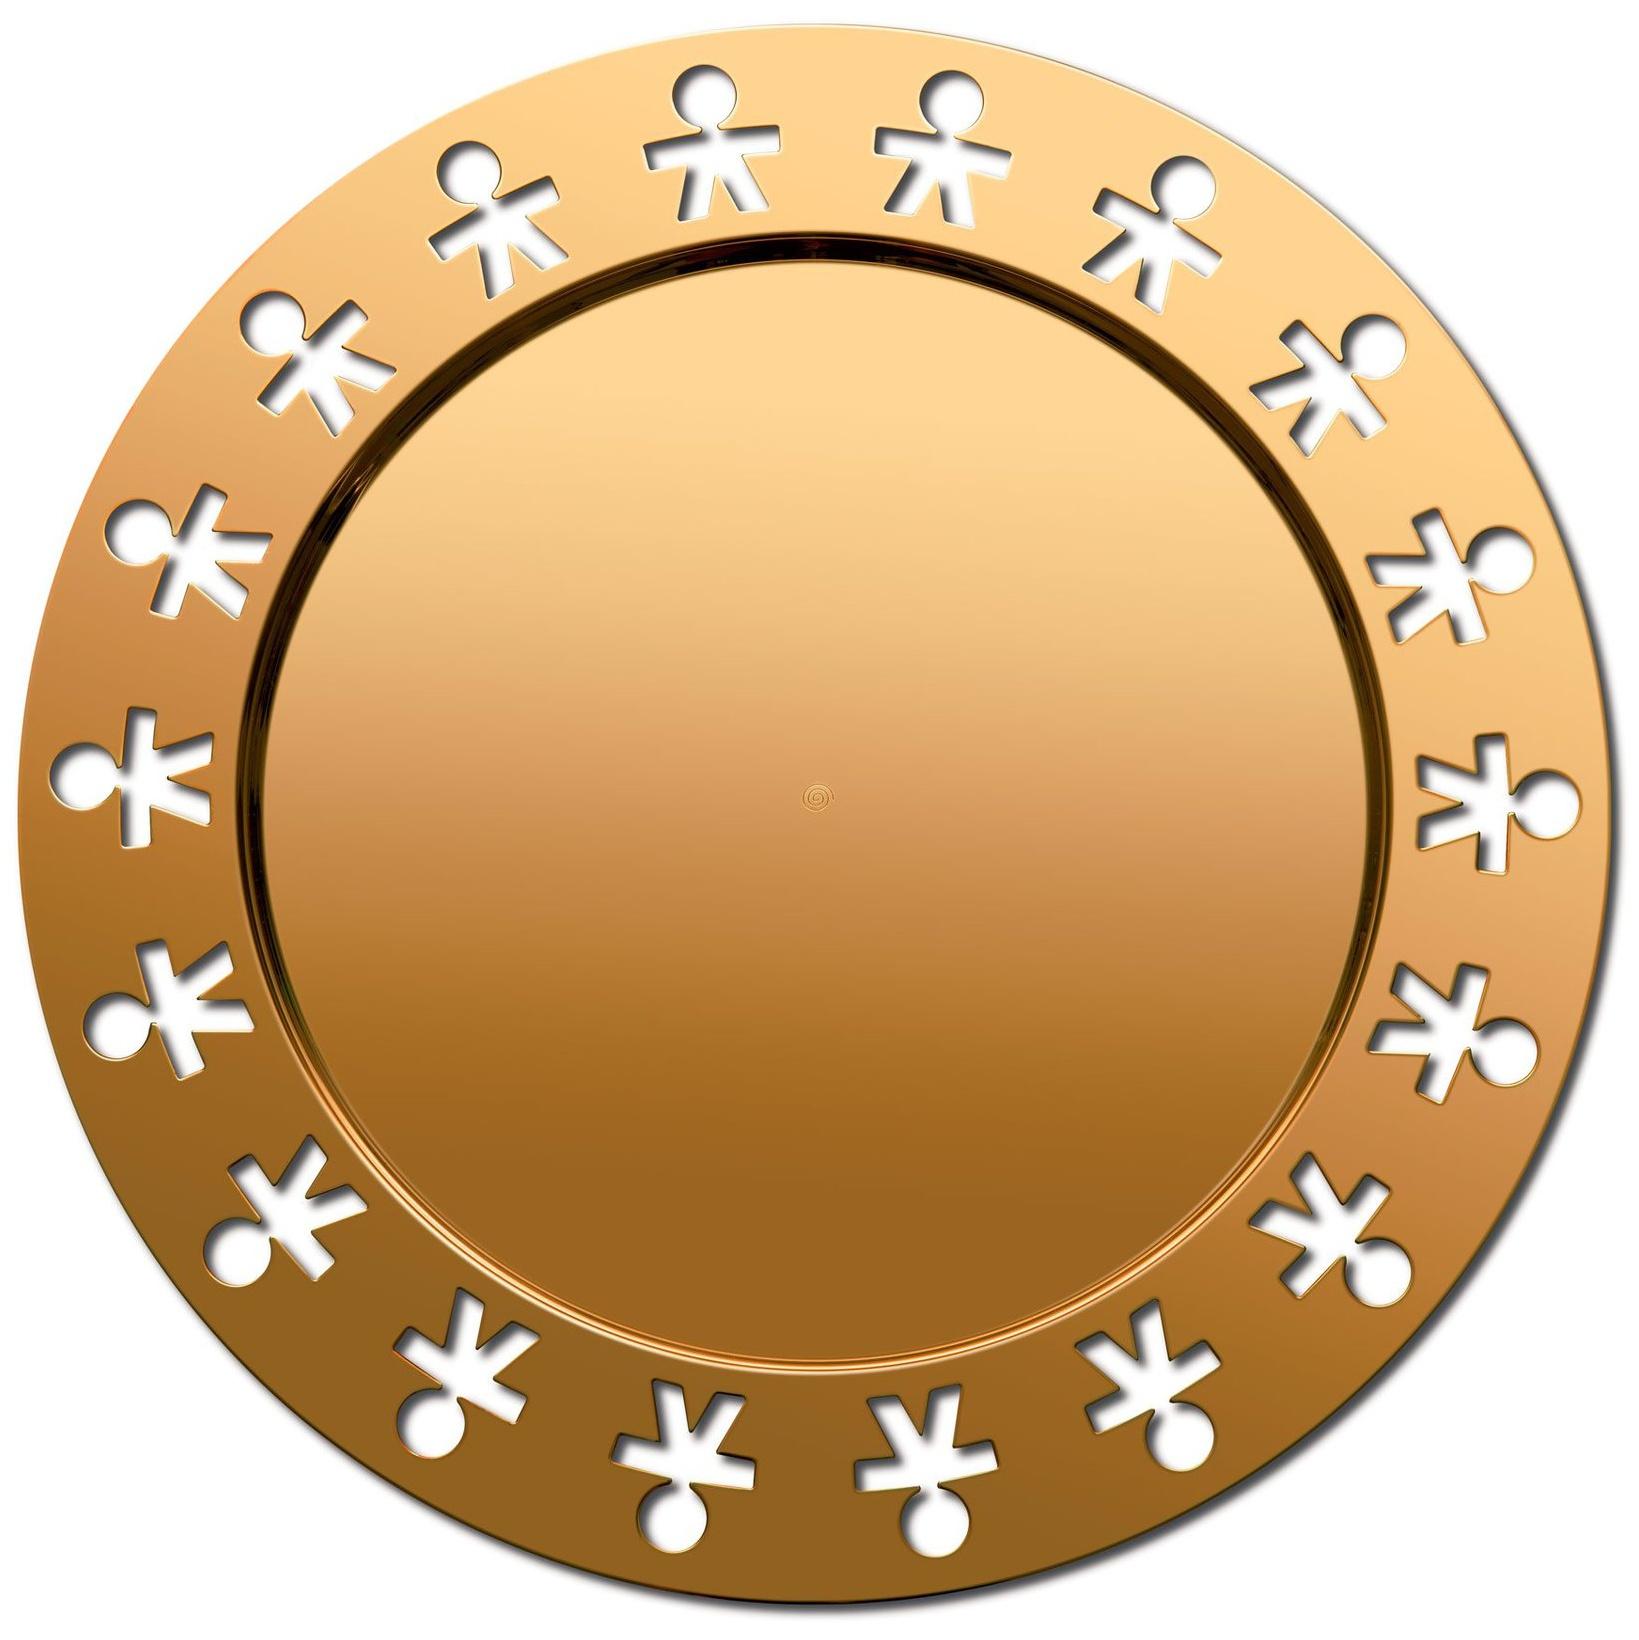 Золотая лихорадка: техника и декор в цвете золота (галерея 2, фото 1)